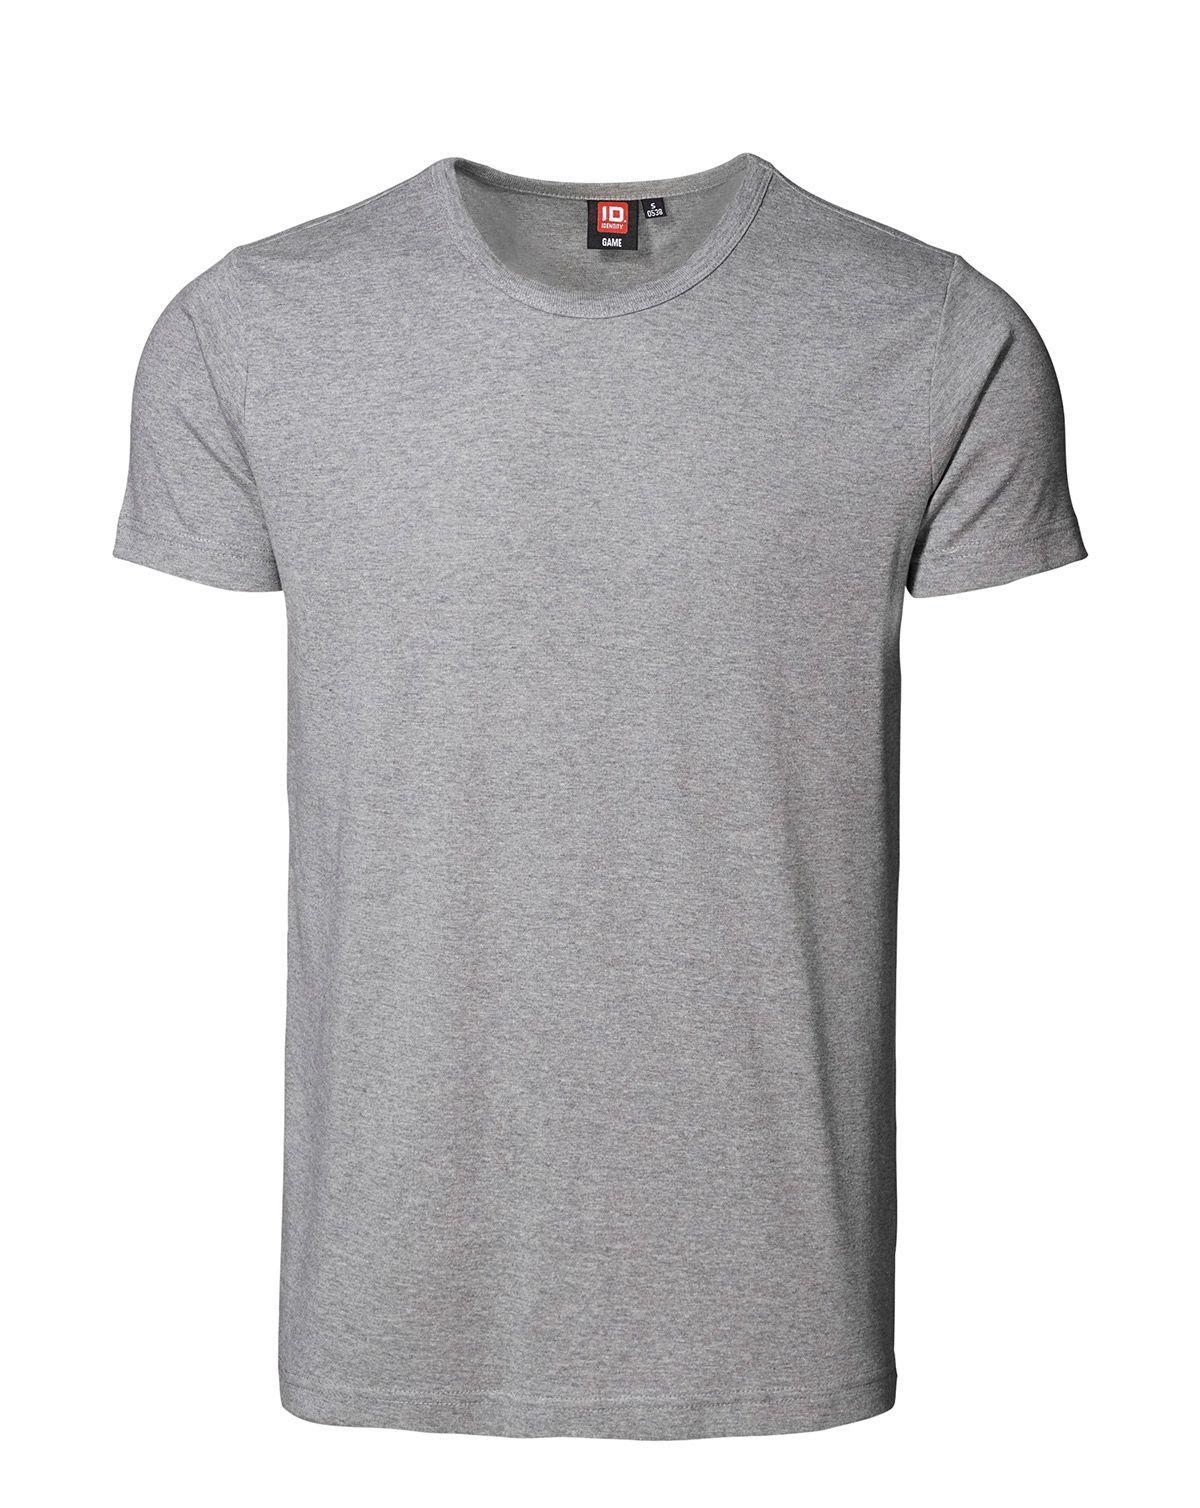 ID 1x1 rib T-shirt (Grå Meleret, 2XL)